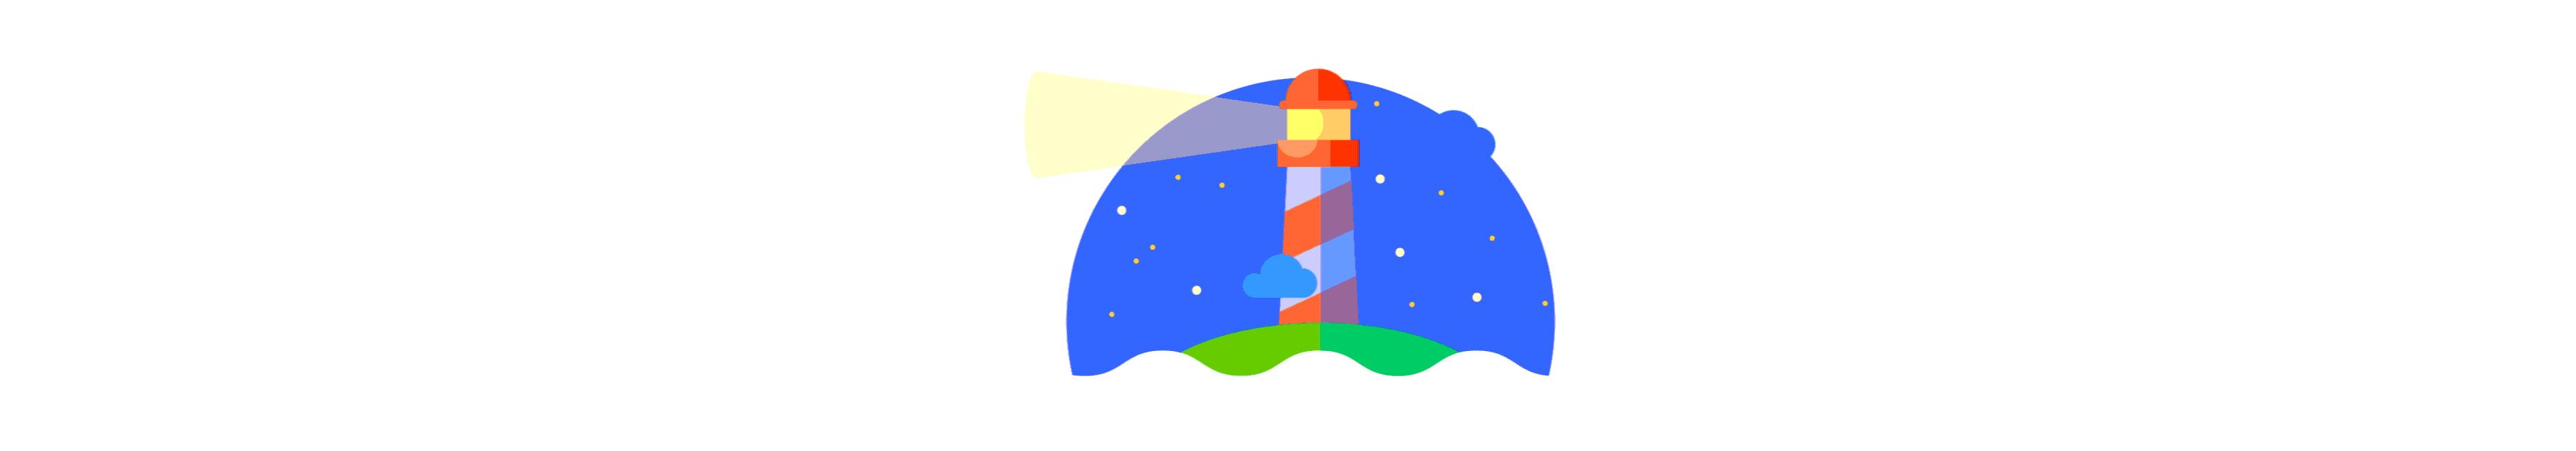 Image for Building a Progressive Web App with Next.js - Part I